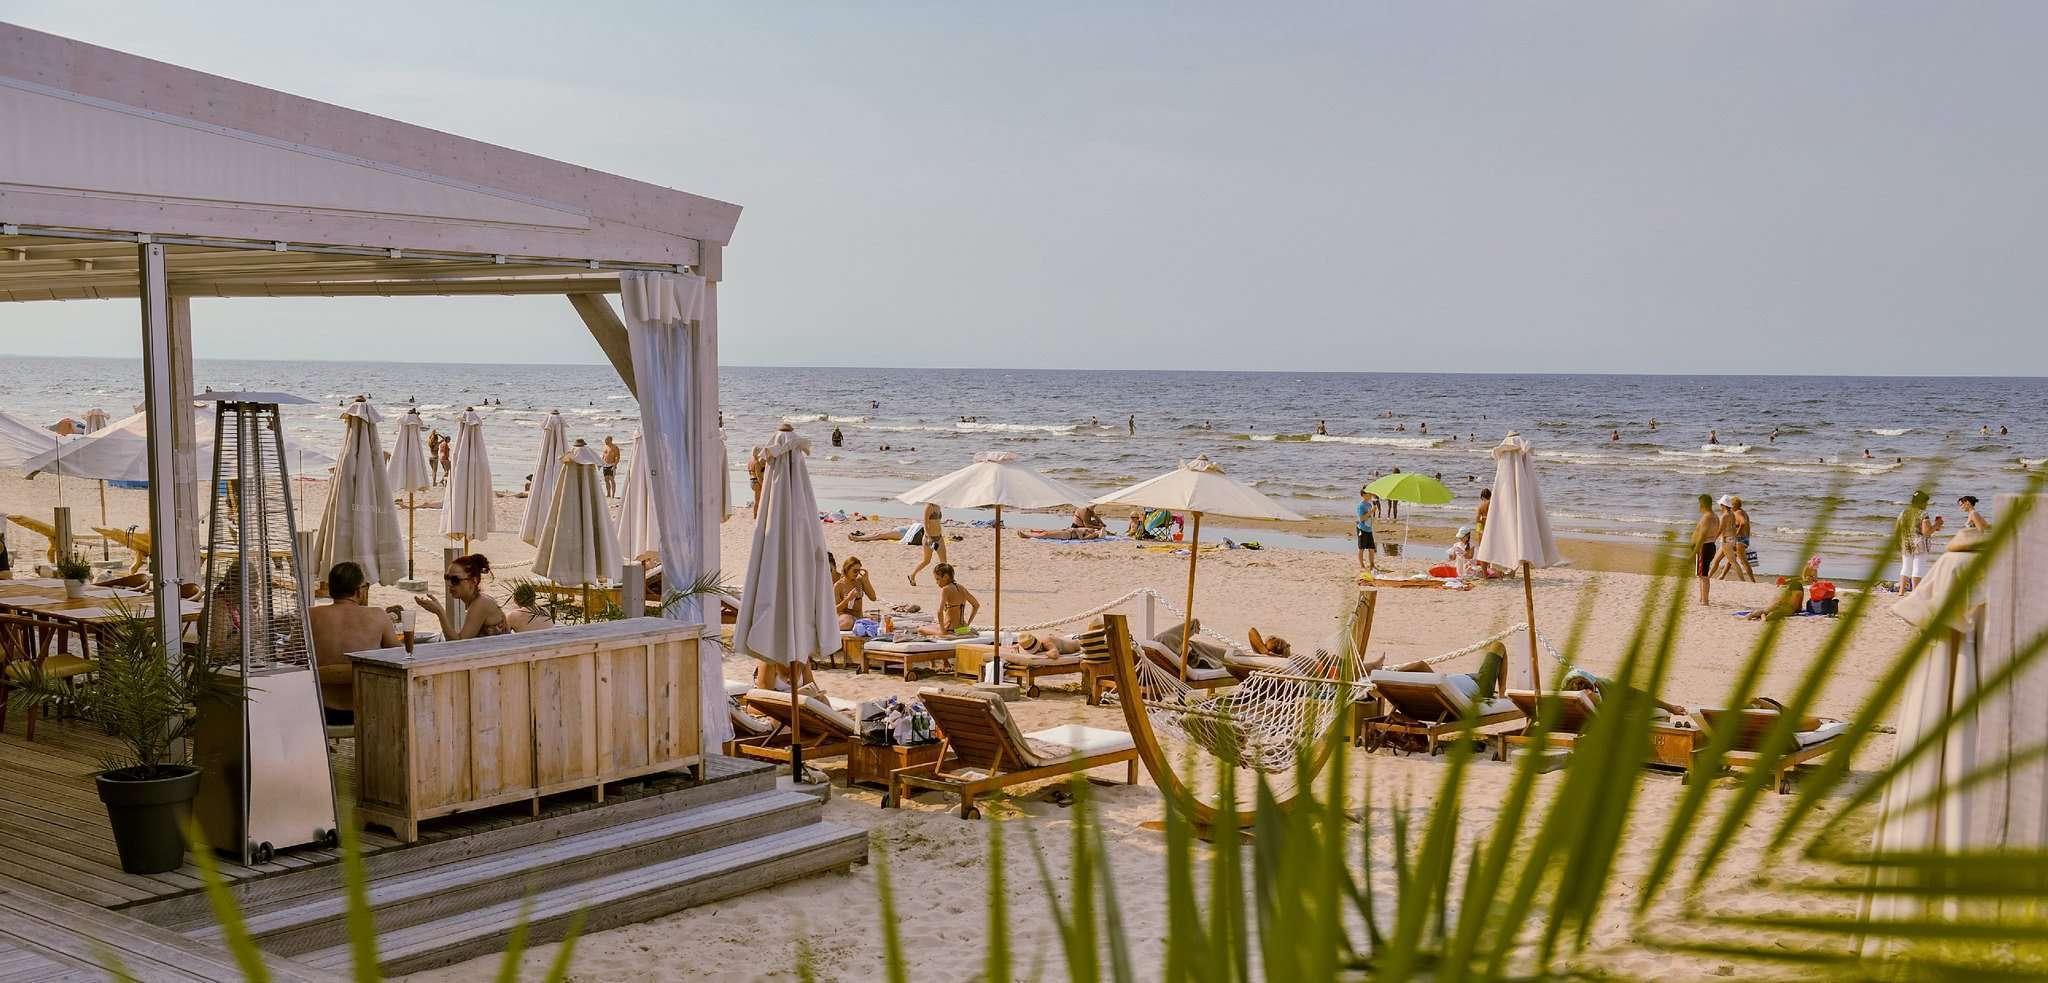 Jurmala 33950552446_27daca6144_k - Latvia tourism